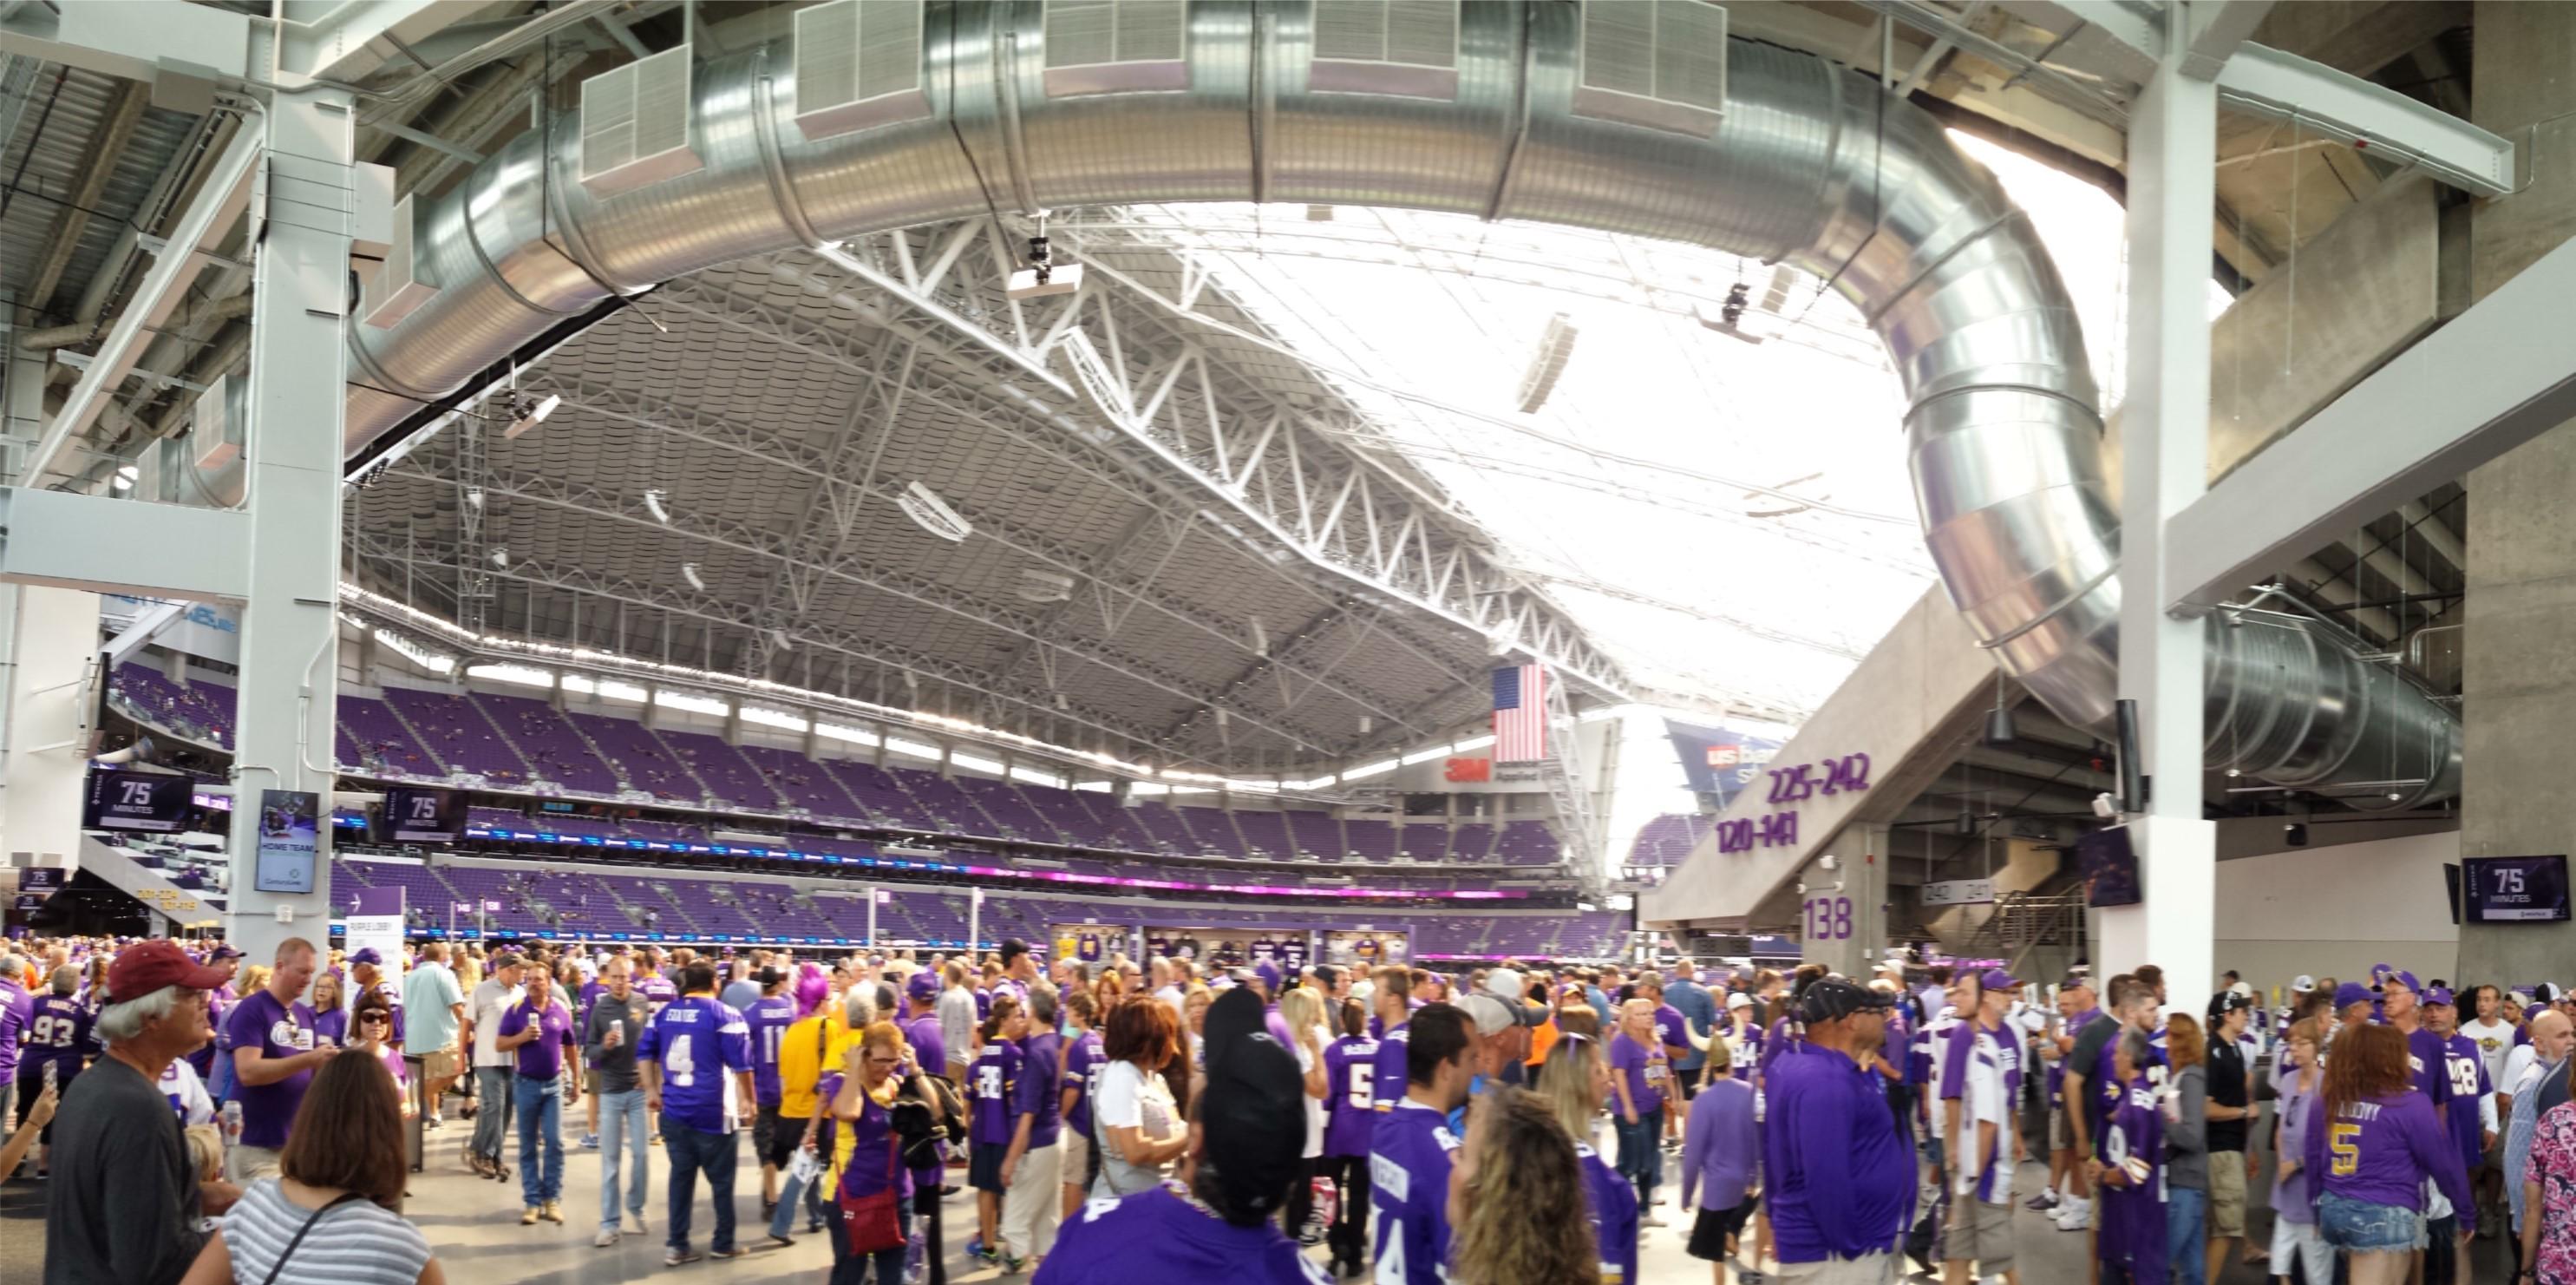 Minnesota Vikings U.S. Bank Stadium First Game - Inside the Doors